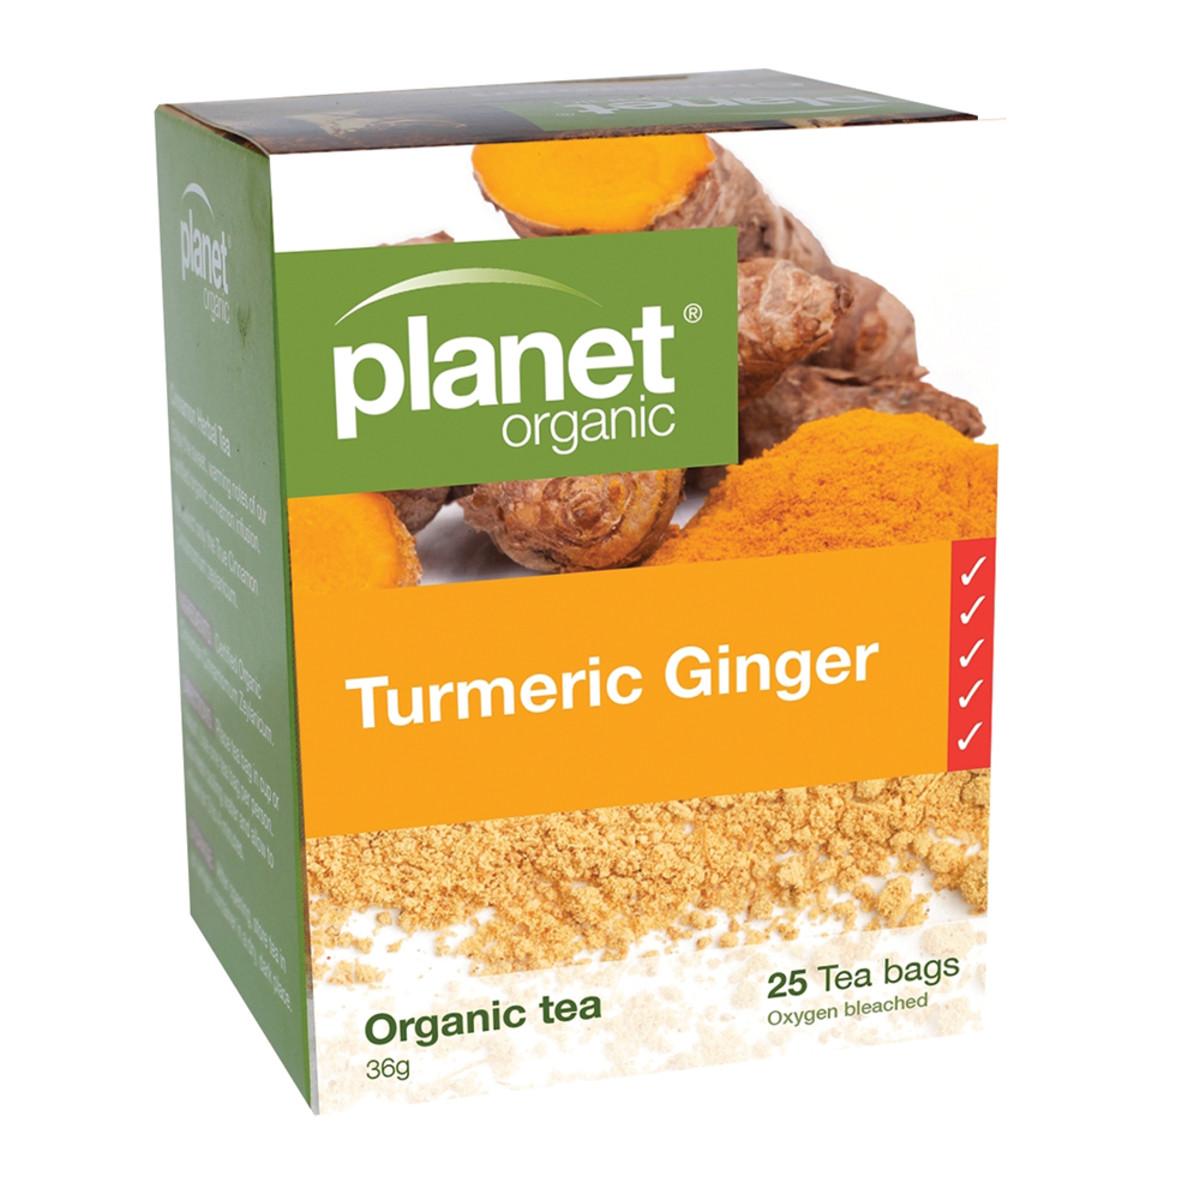 PLANET ORGANIC TURMERIC GINGER 25TB